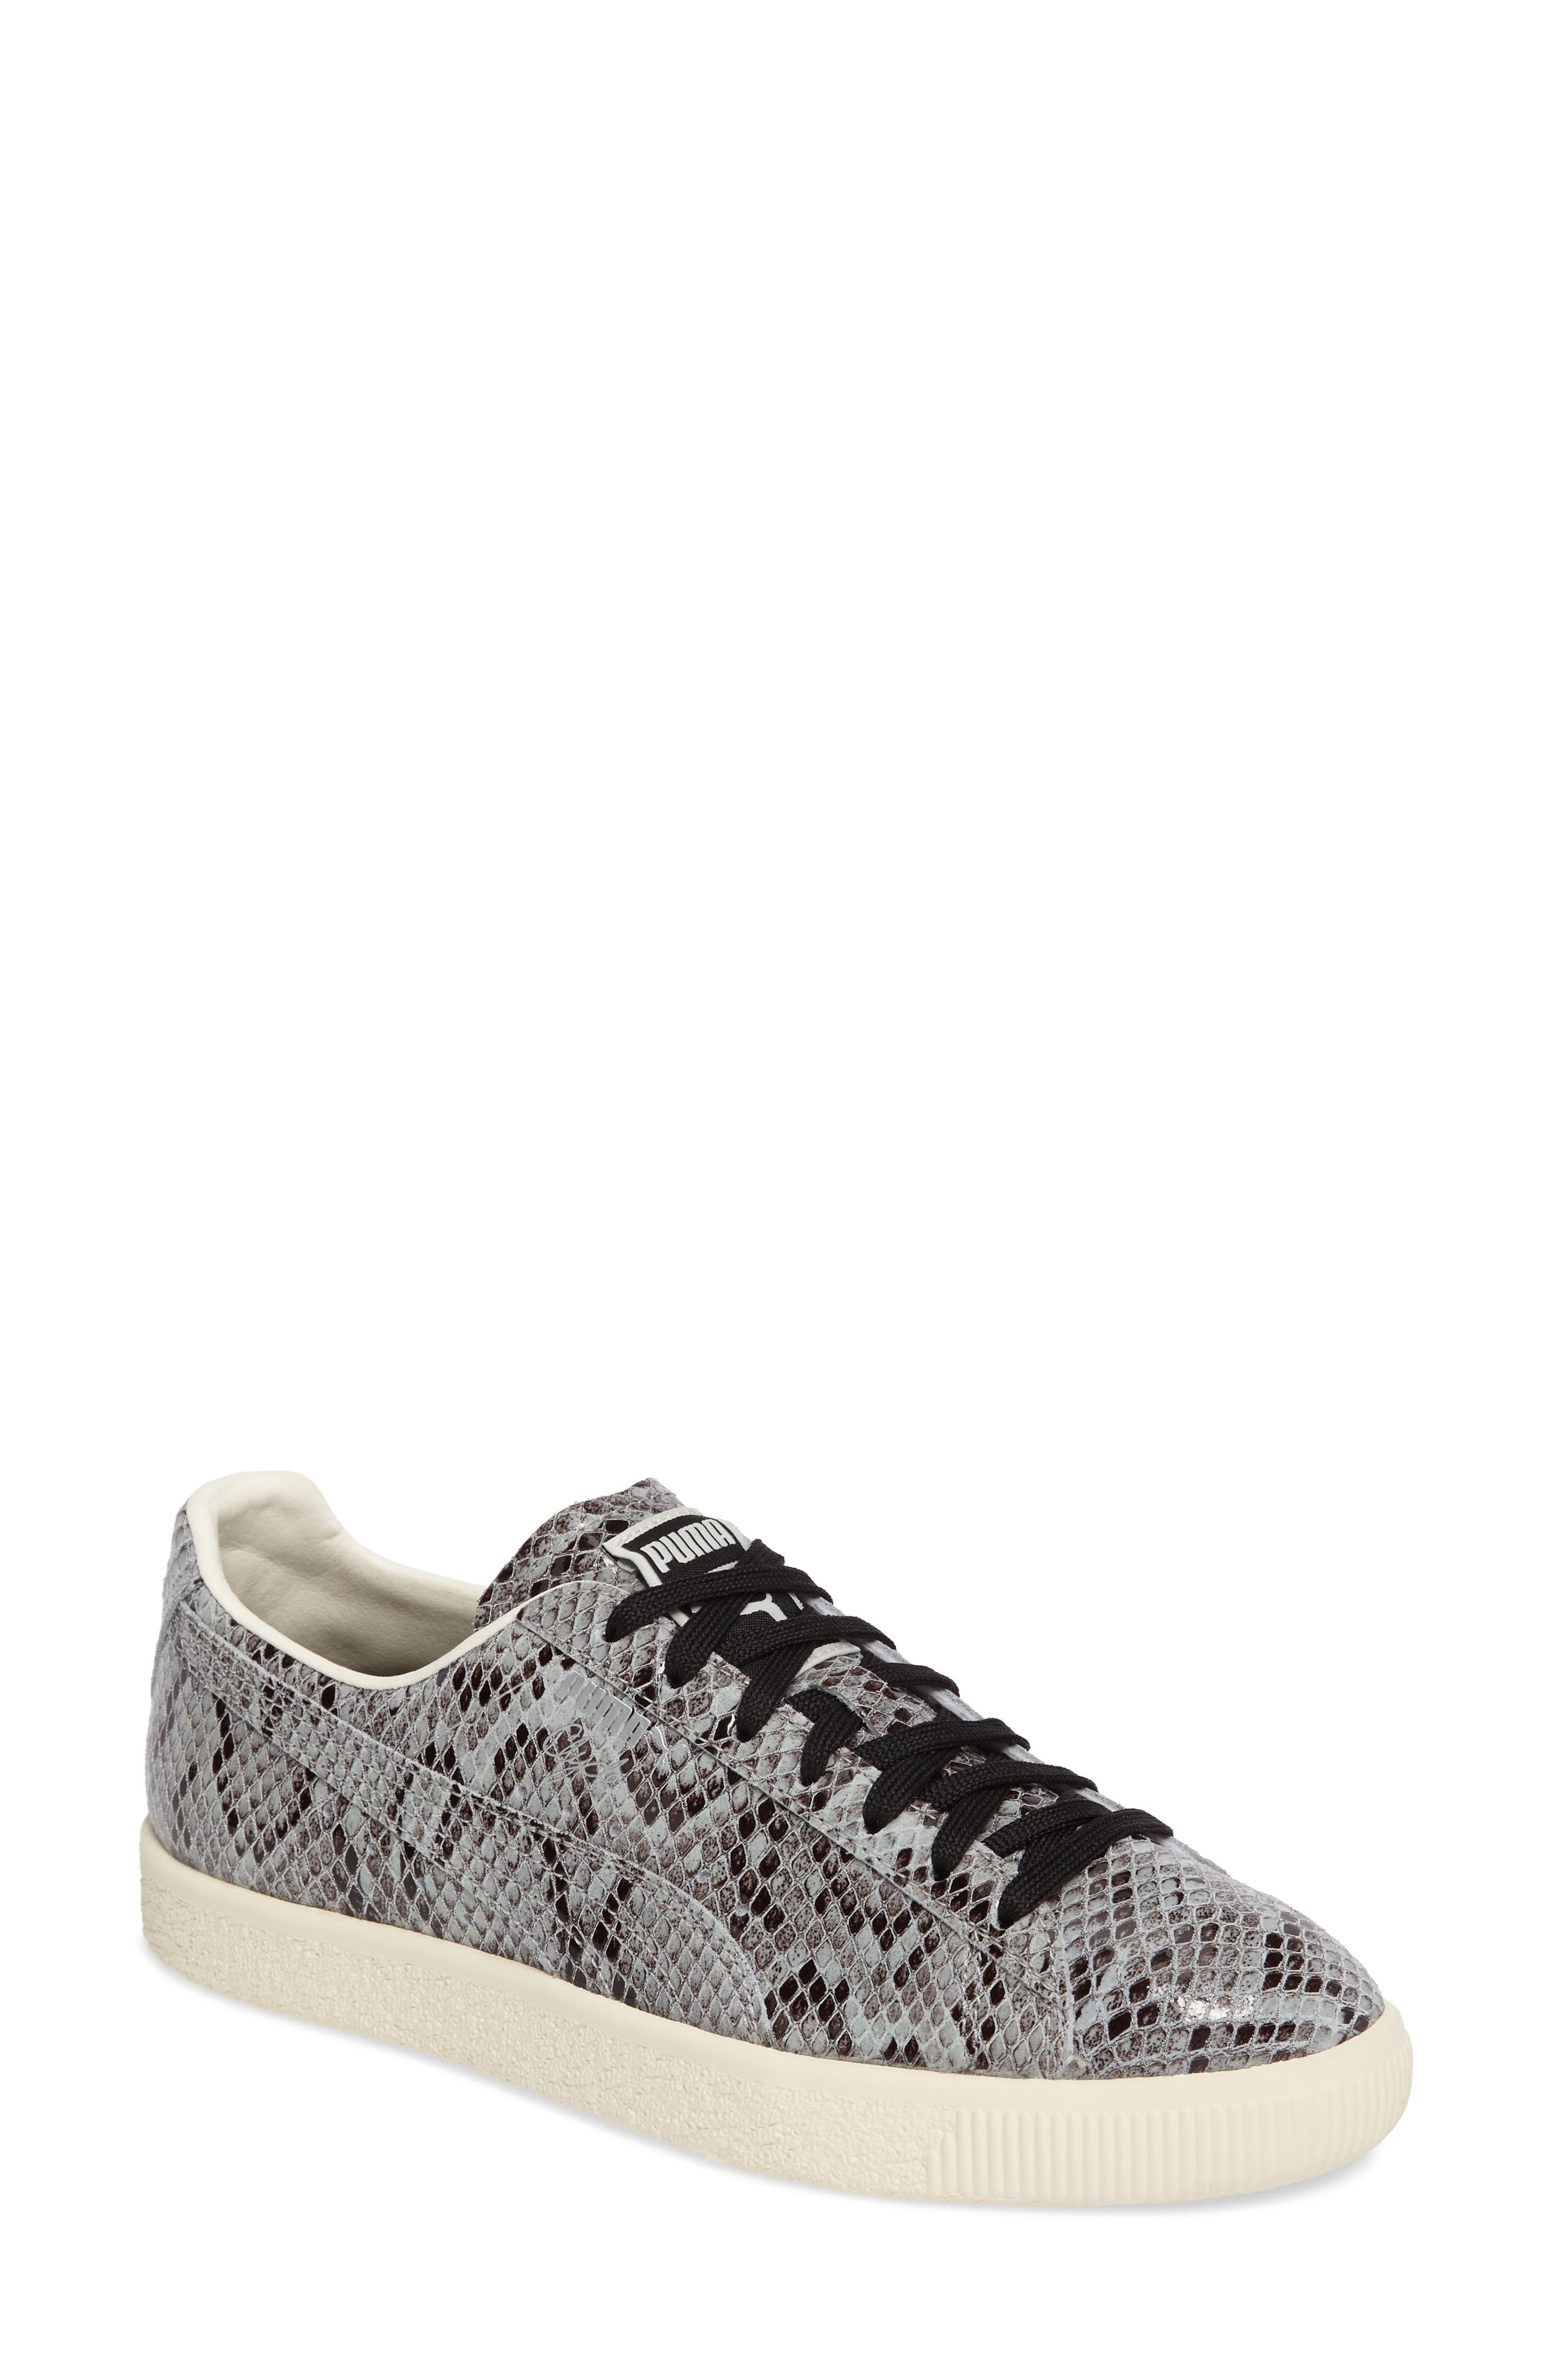 Clyde Sneaker,                             Main thumbnail 1, color,                             Puma Silver